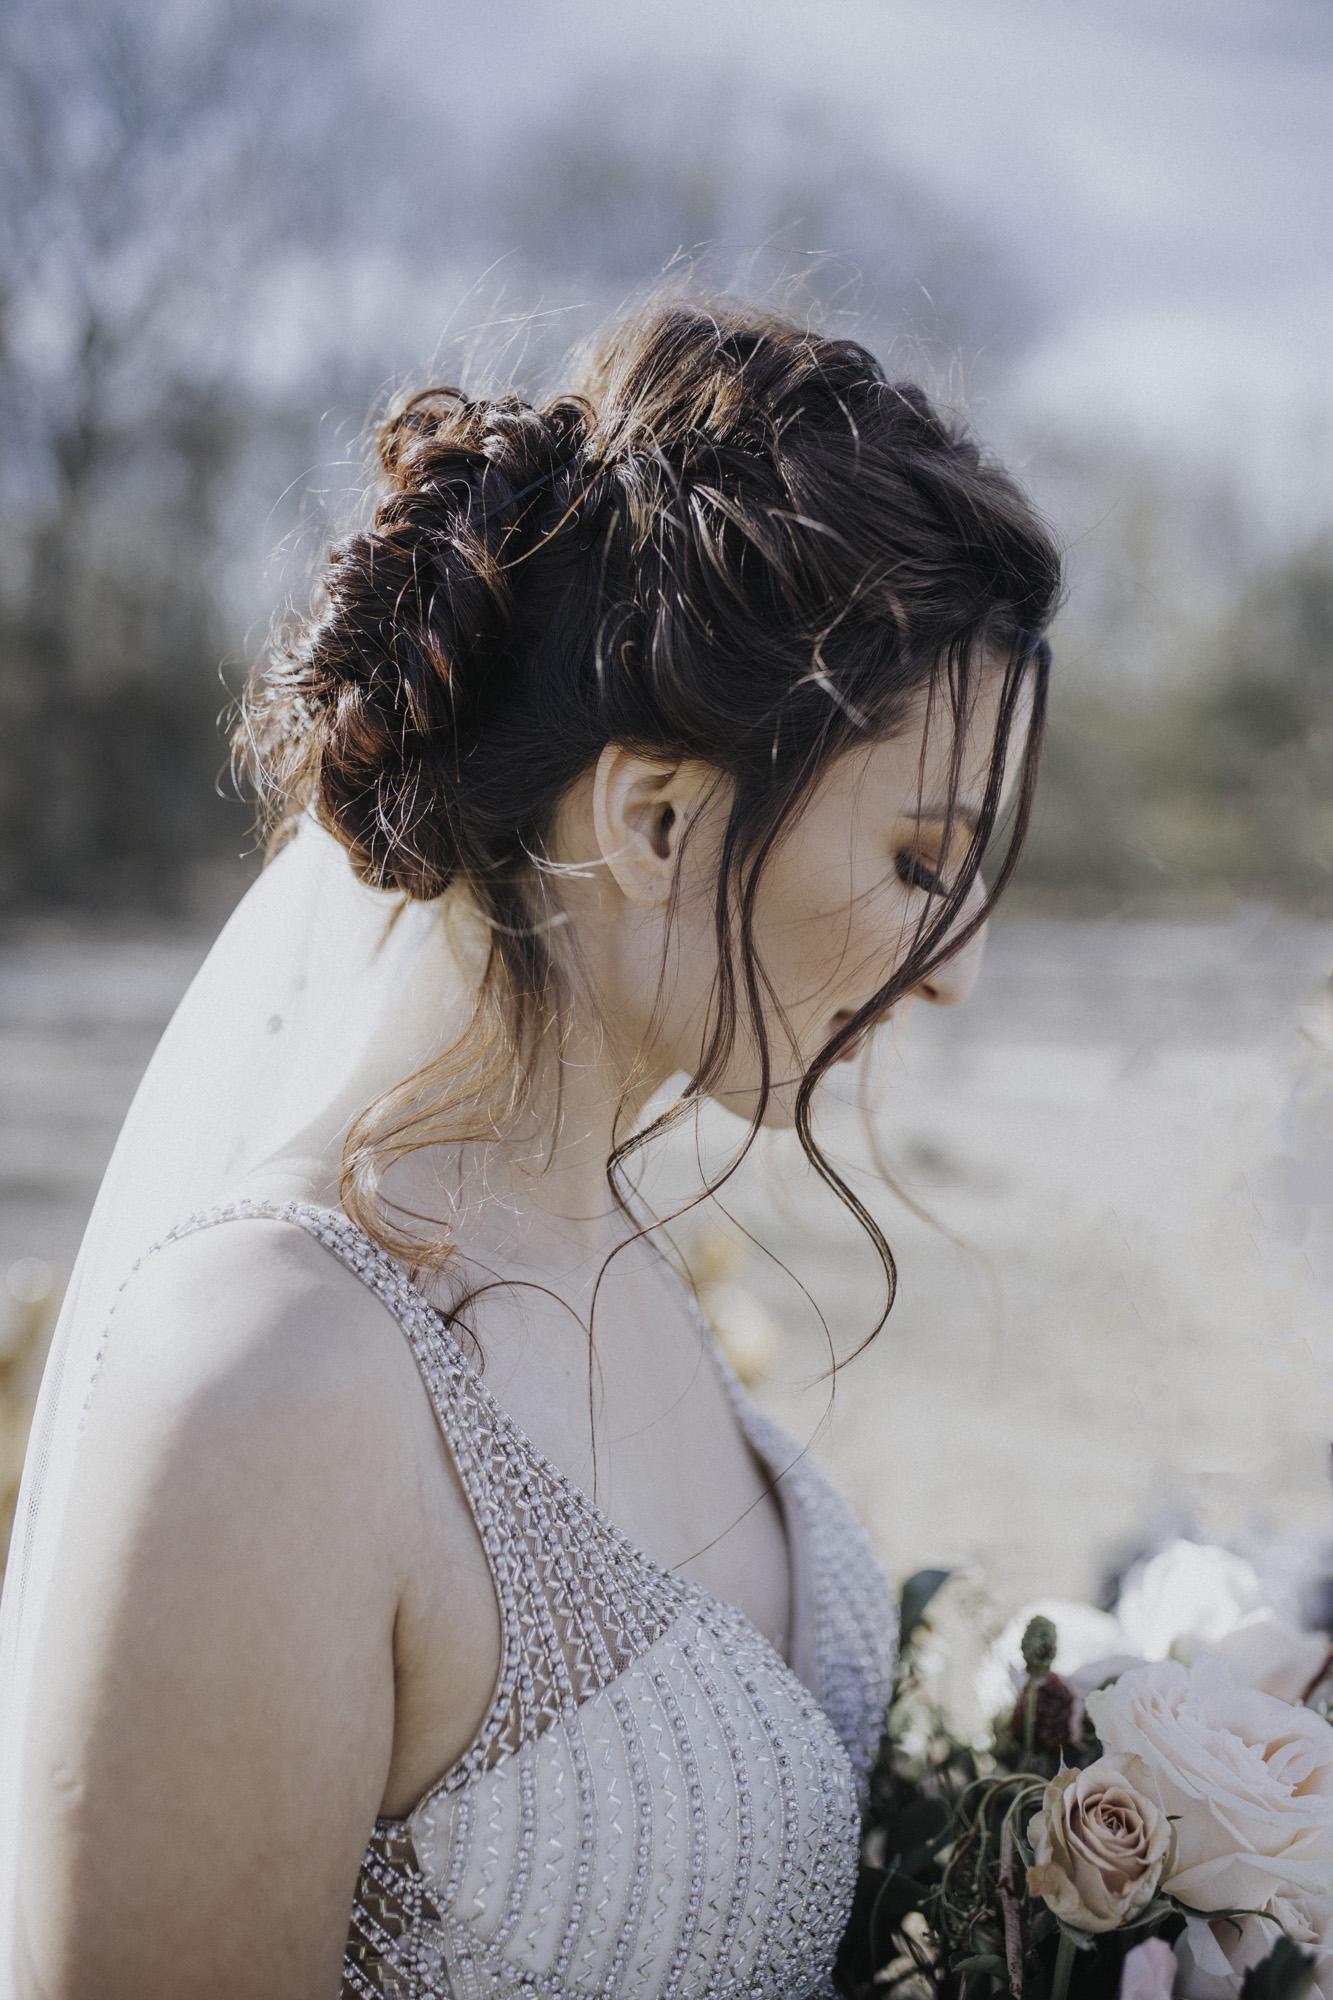 Cate_Ann_Photography_Dayton_Ohio_Wedding_Elopement_And_Engagement_PhotographerIMG_8519-Edit.jpg